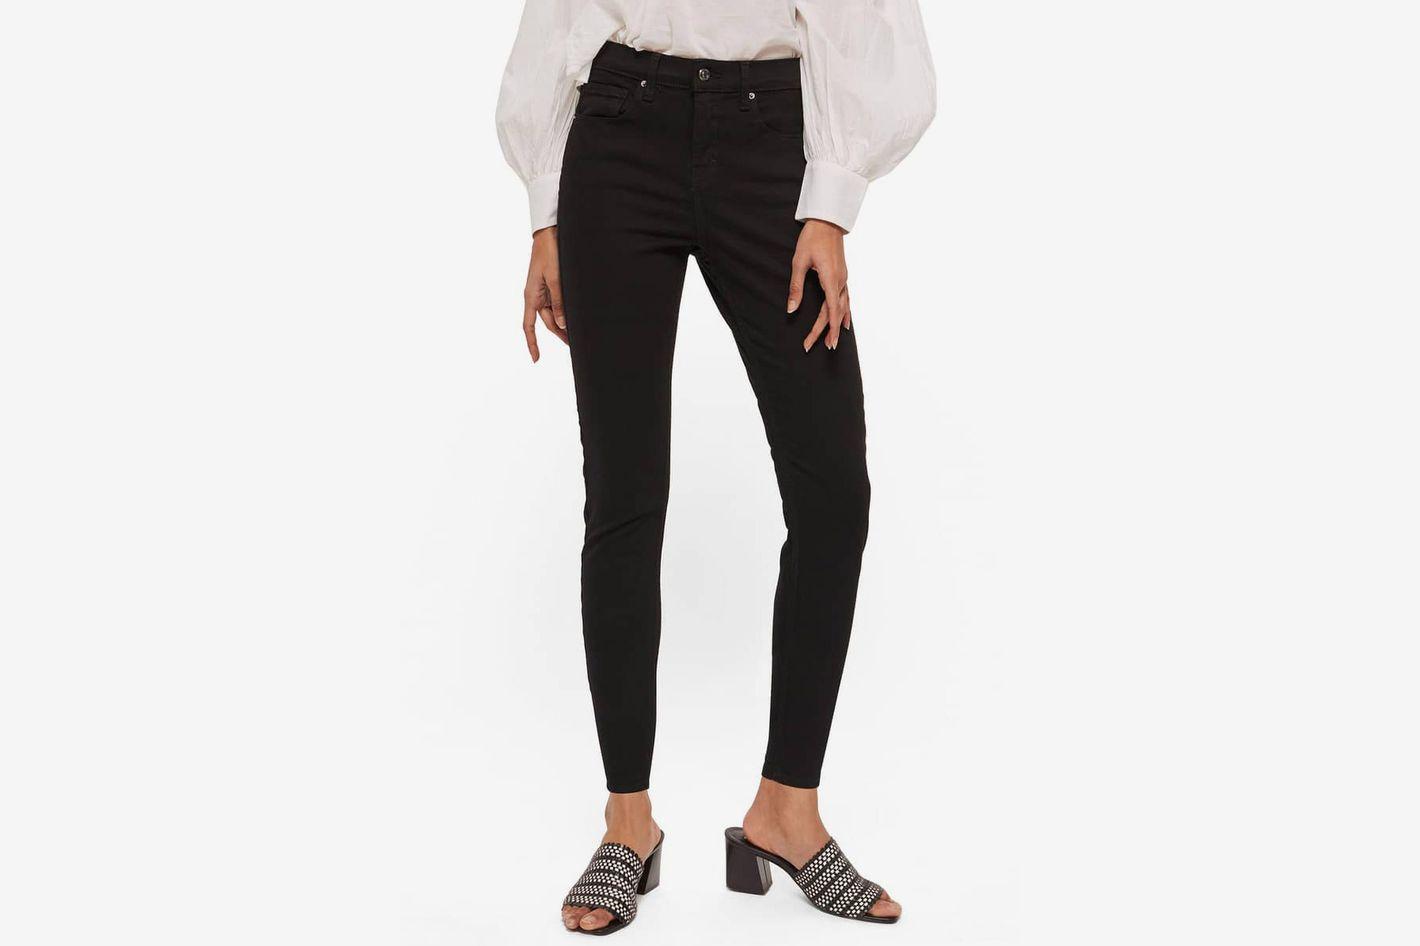 a3eea8008a5 Topshop Jamie Petite Black Jeans